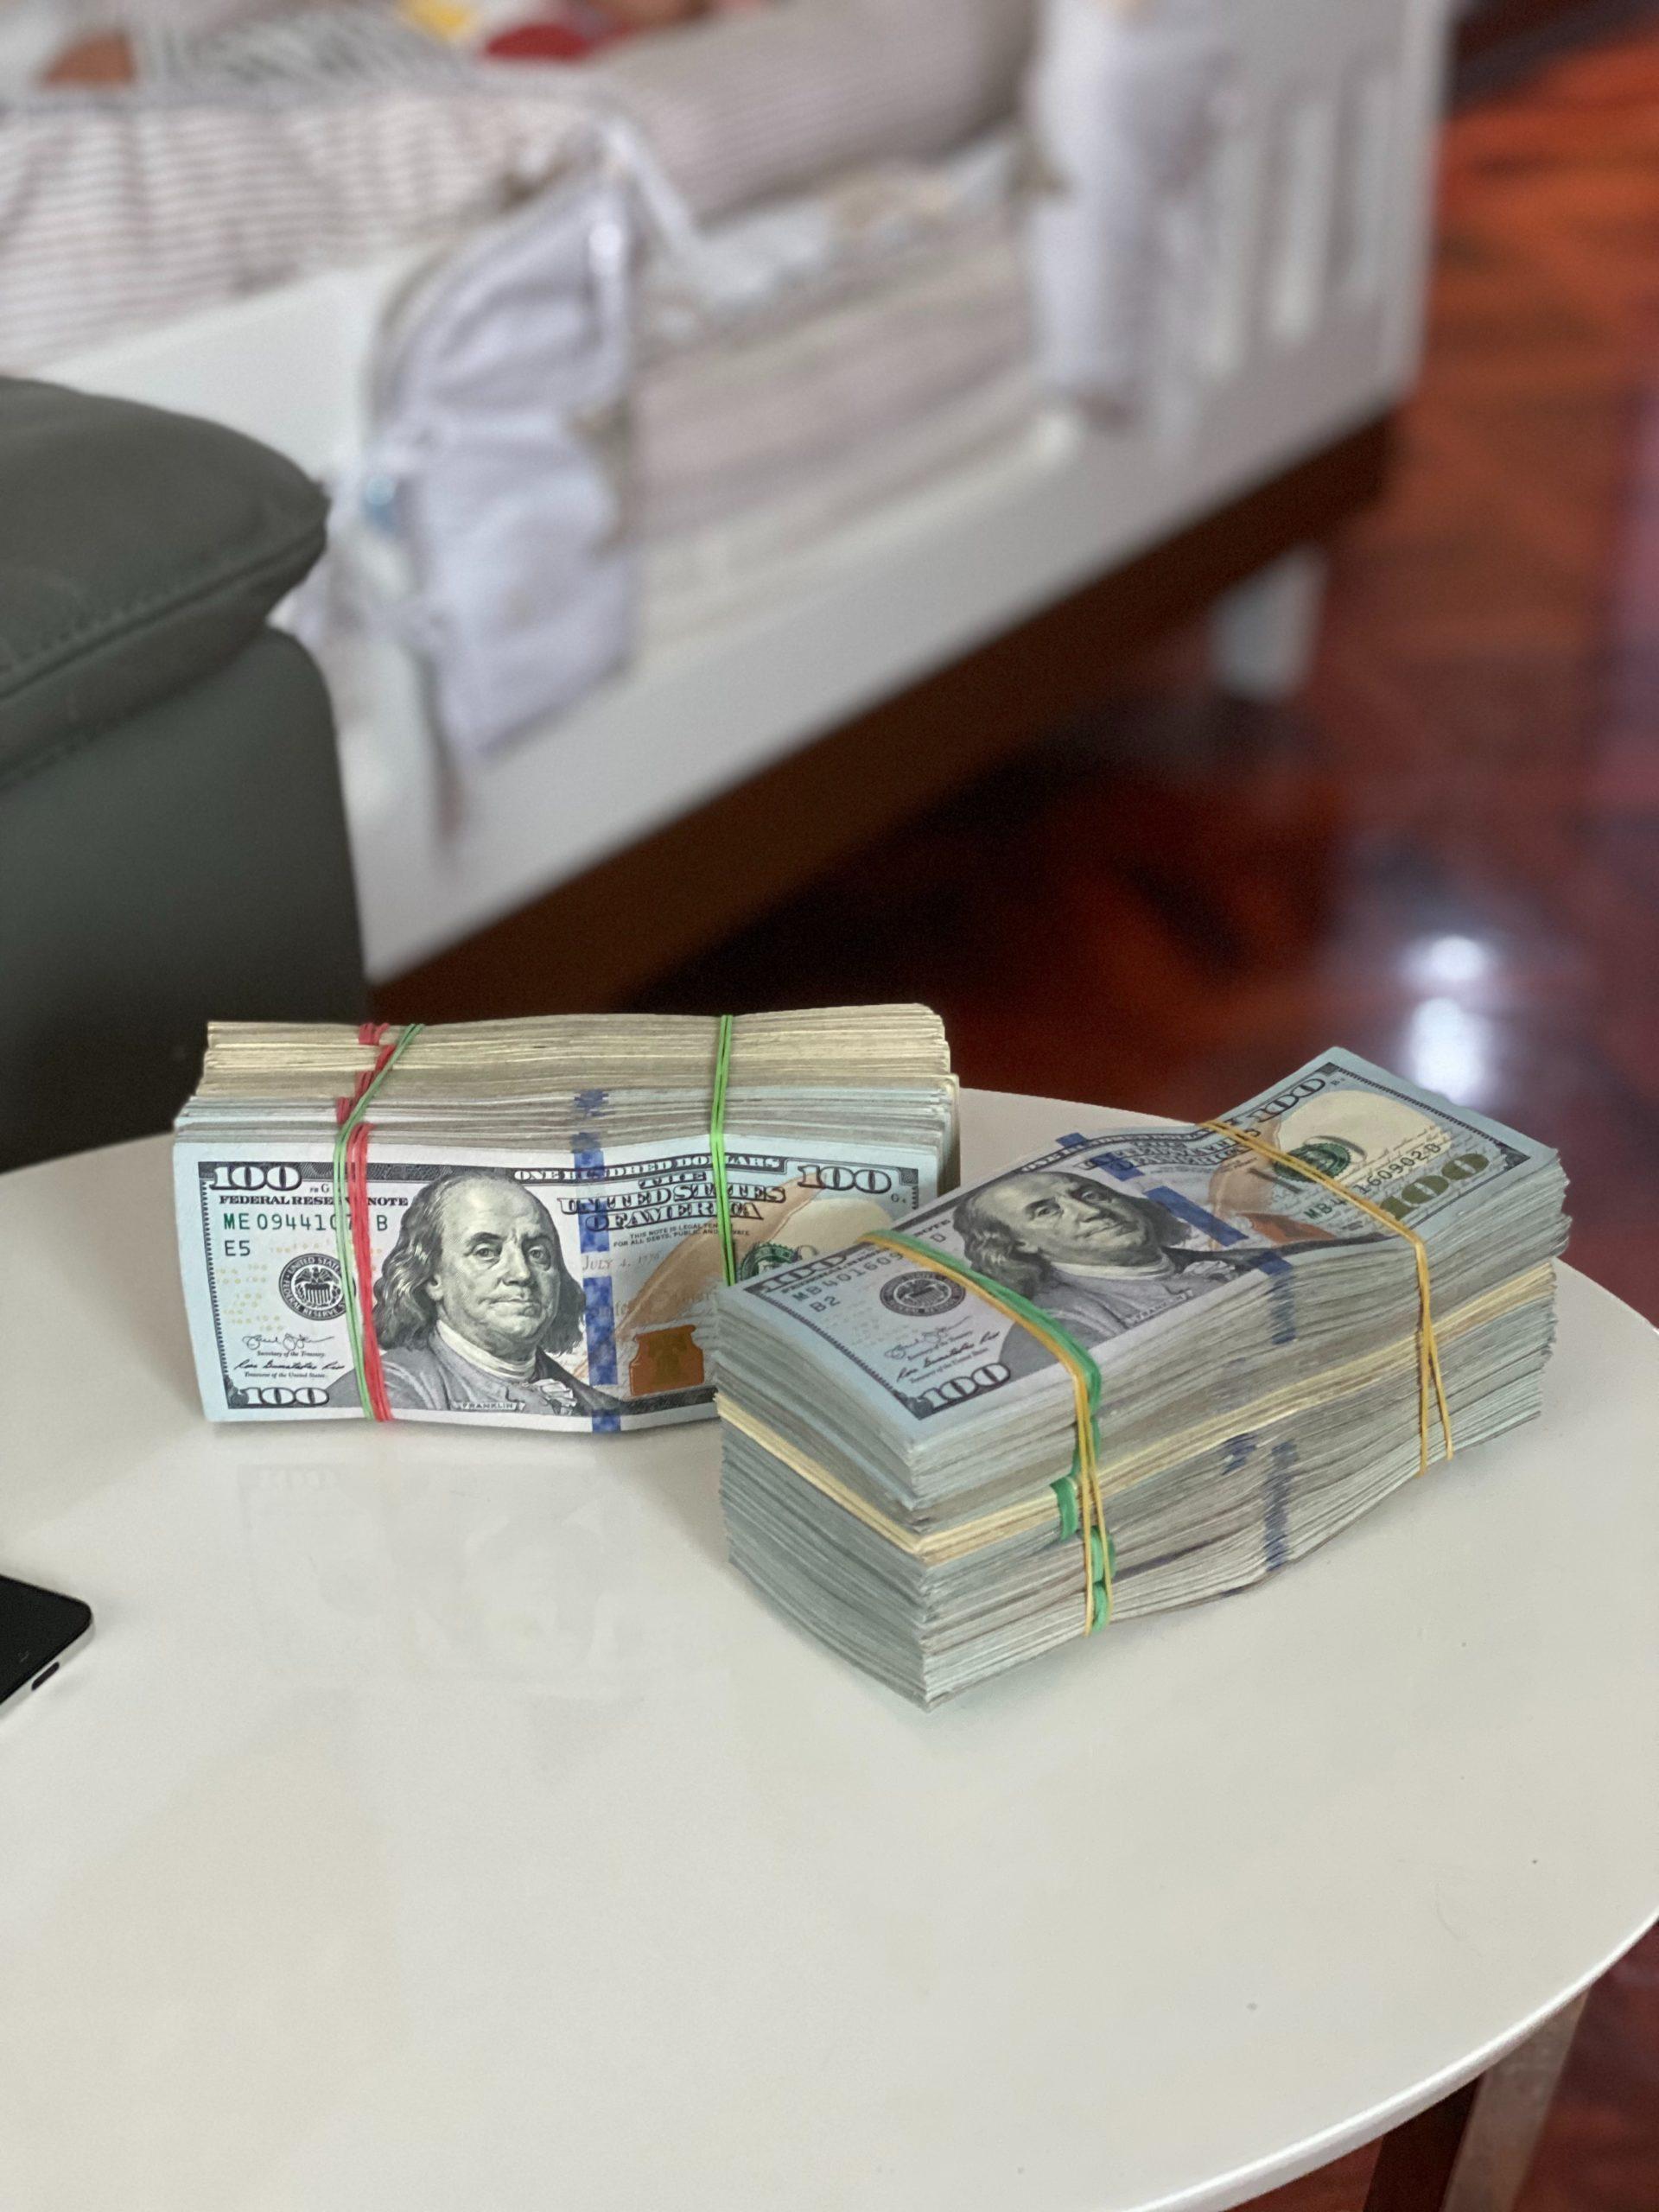 How Do You Keep Inheritance Money Separate?